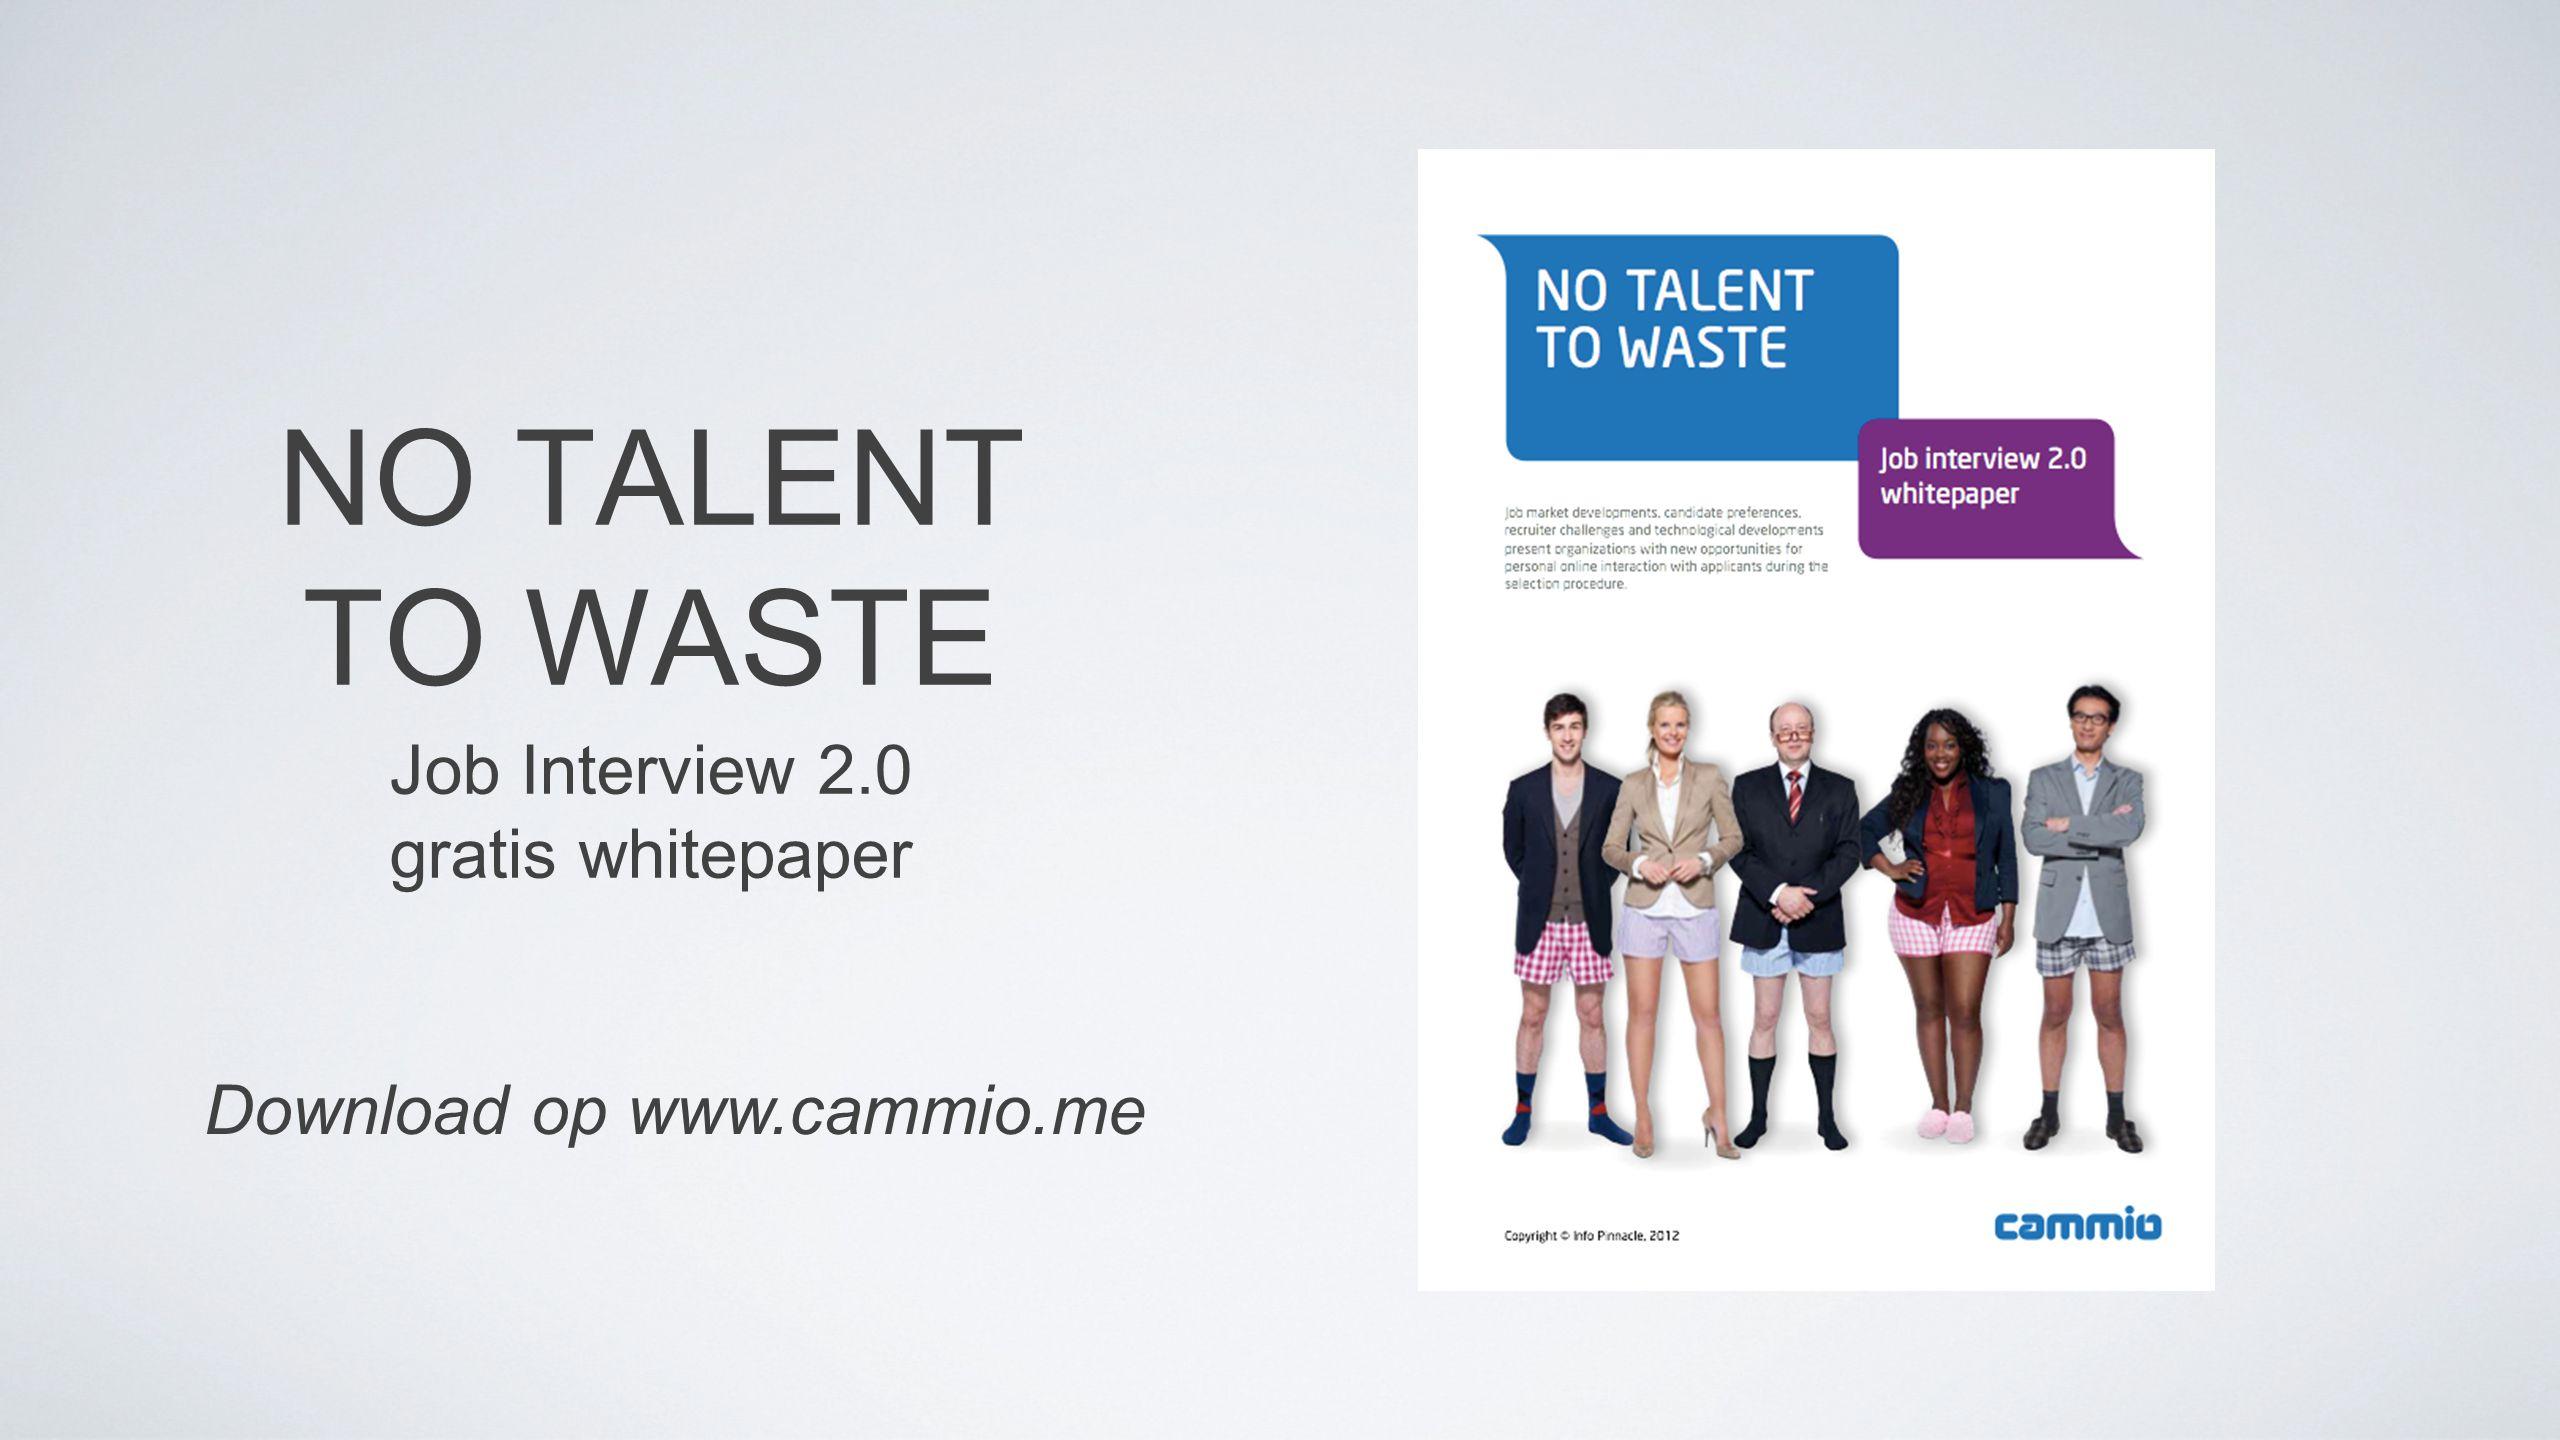 NO TALENT TO WASTE Job Interview 2.0 gratis whitepaper Download op www.cammio.me